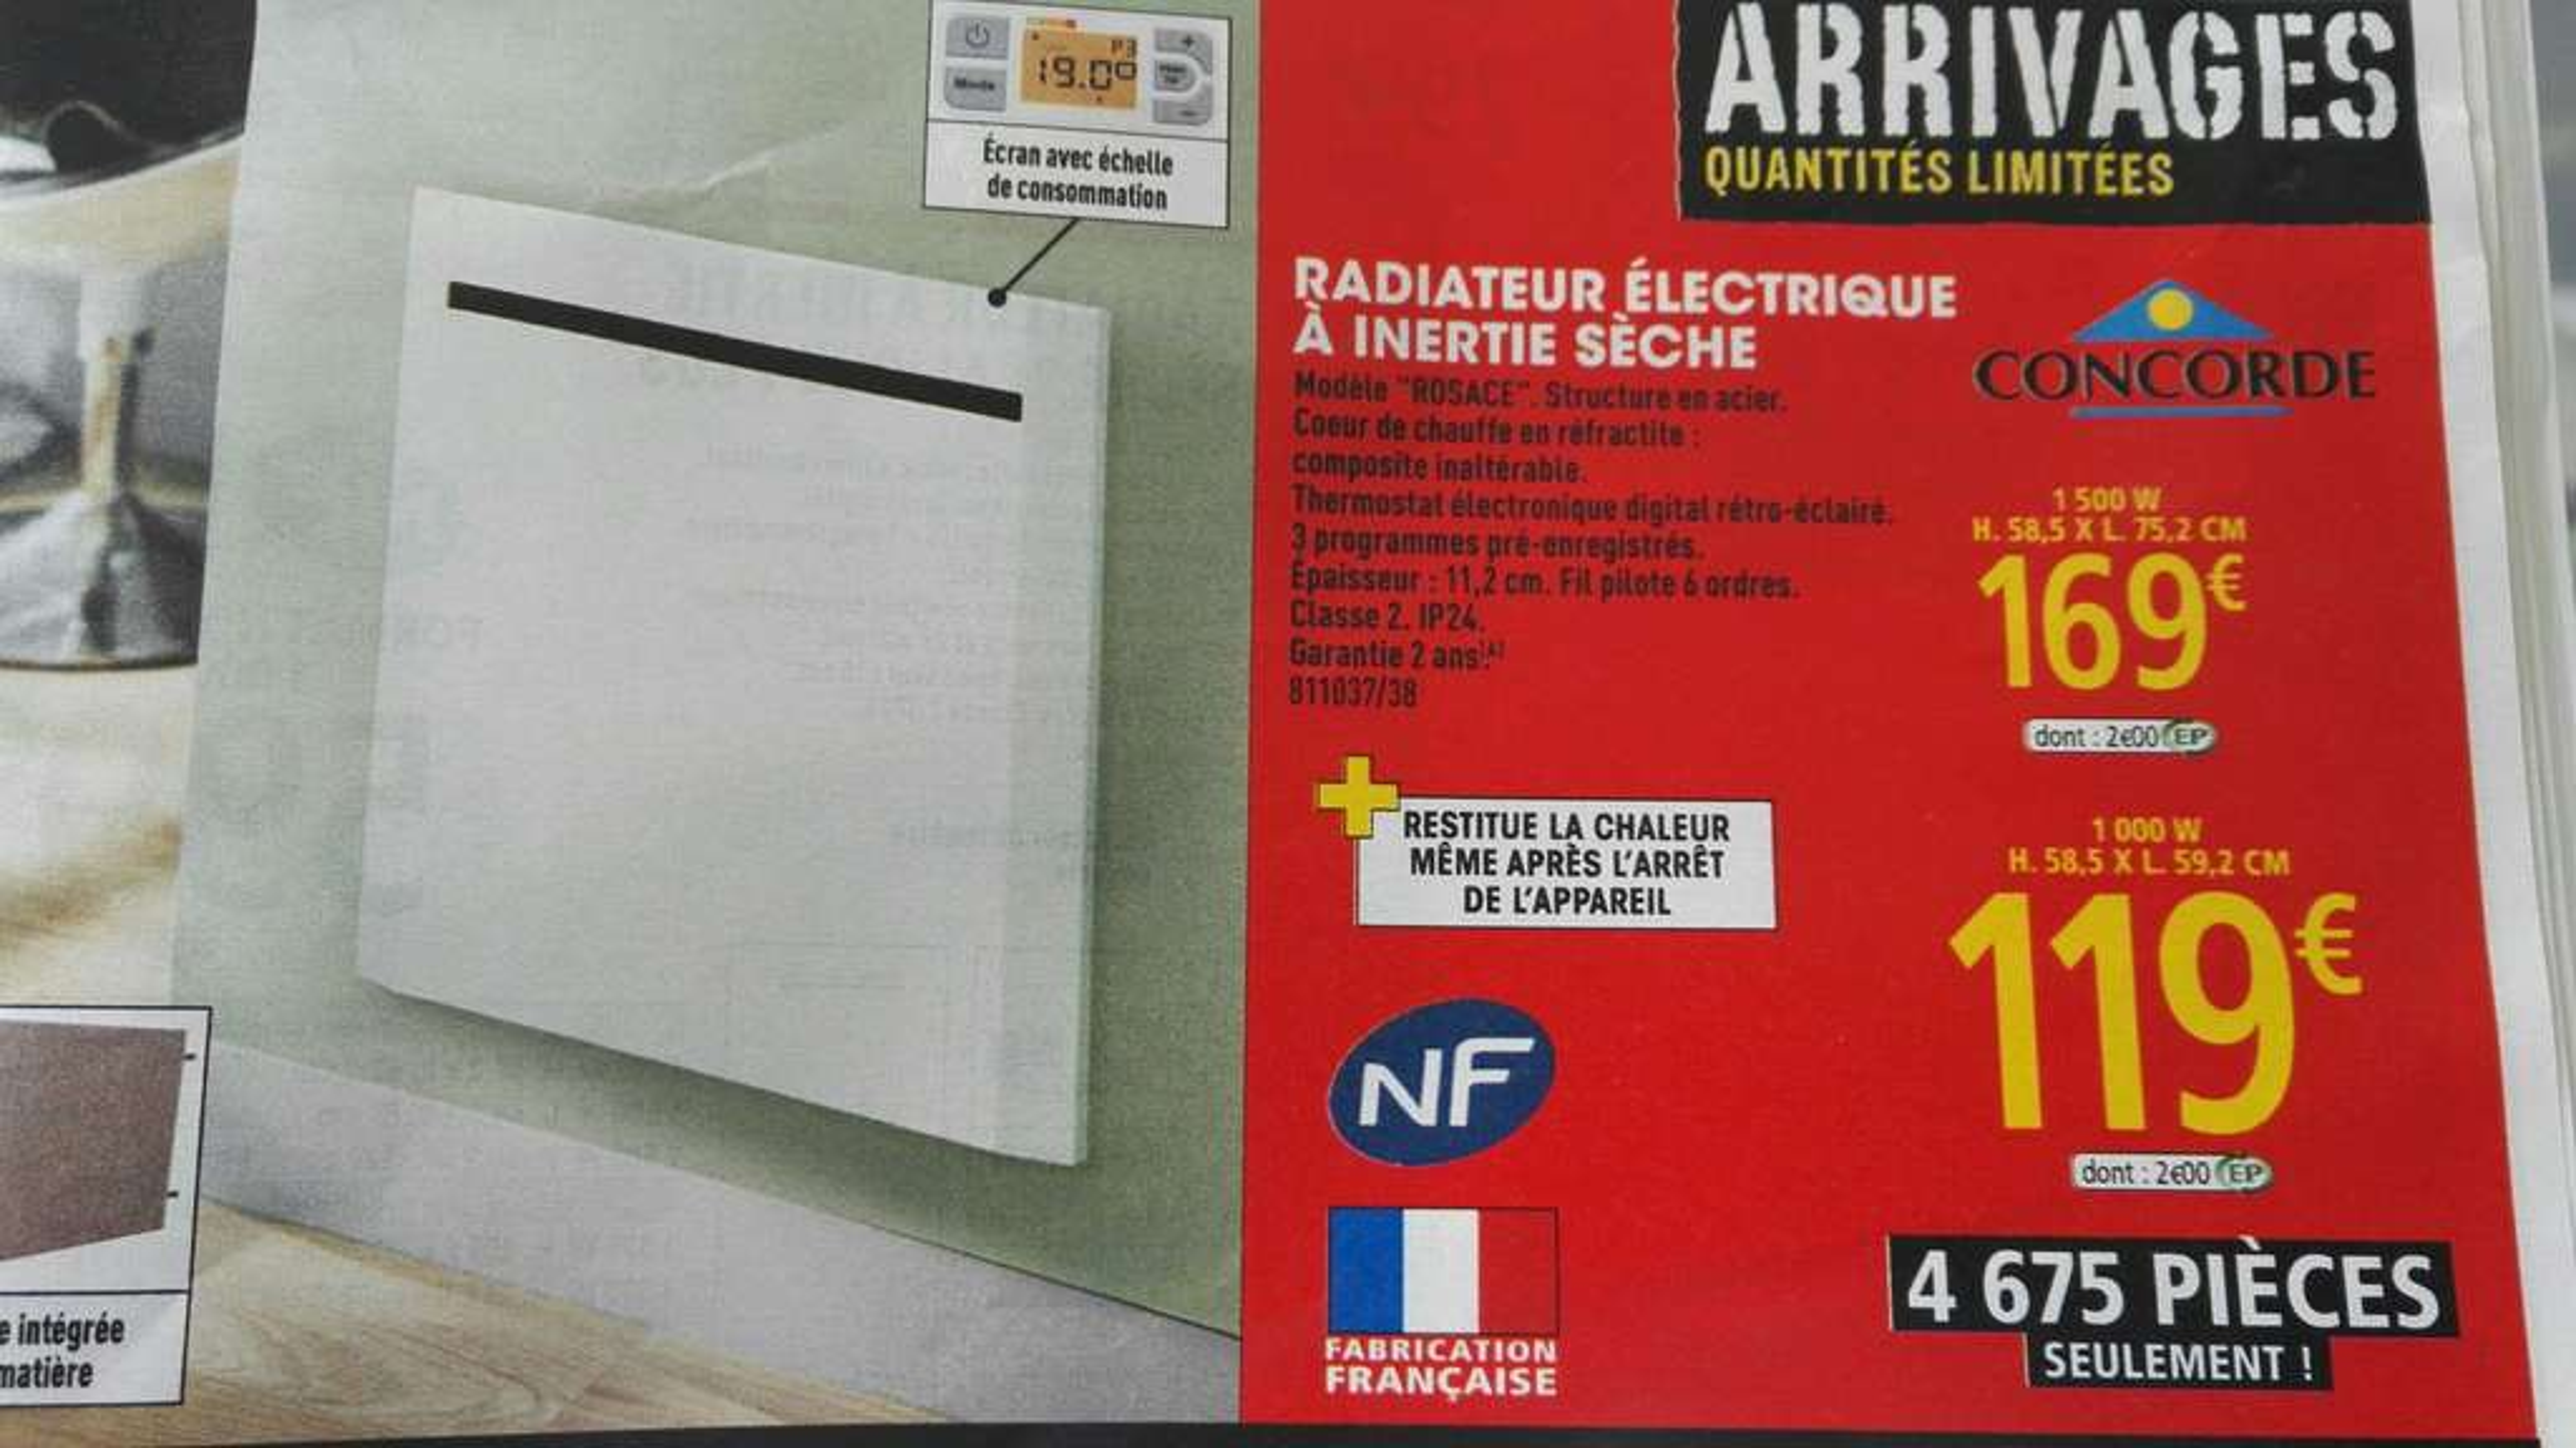 avis radiateur concorde top radiateur electrique with avis radiateur concorde cool boitier de. Black Bedroom Furniture Sets. Home Design Ideas